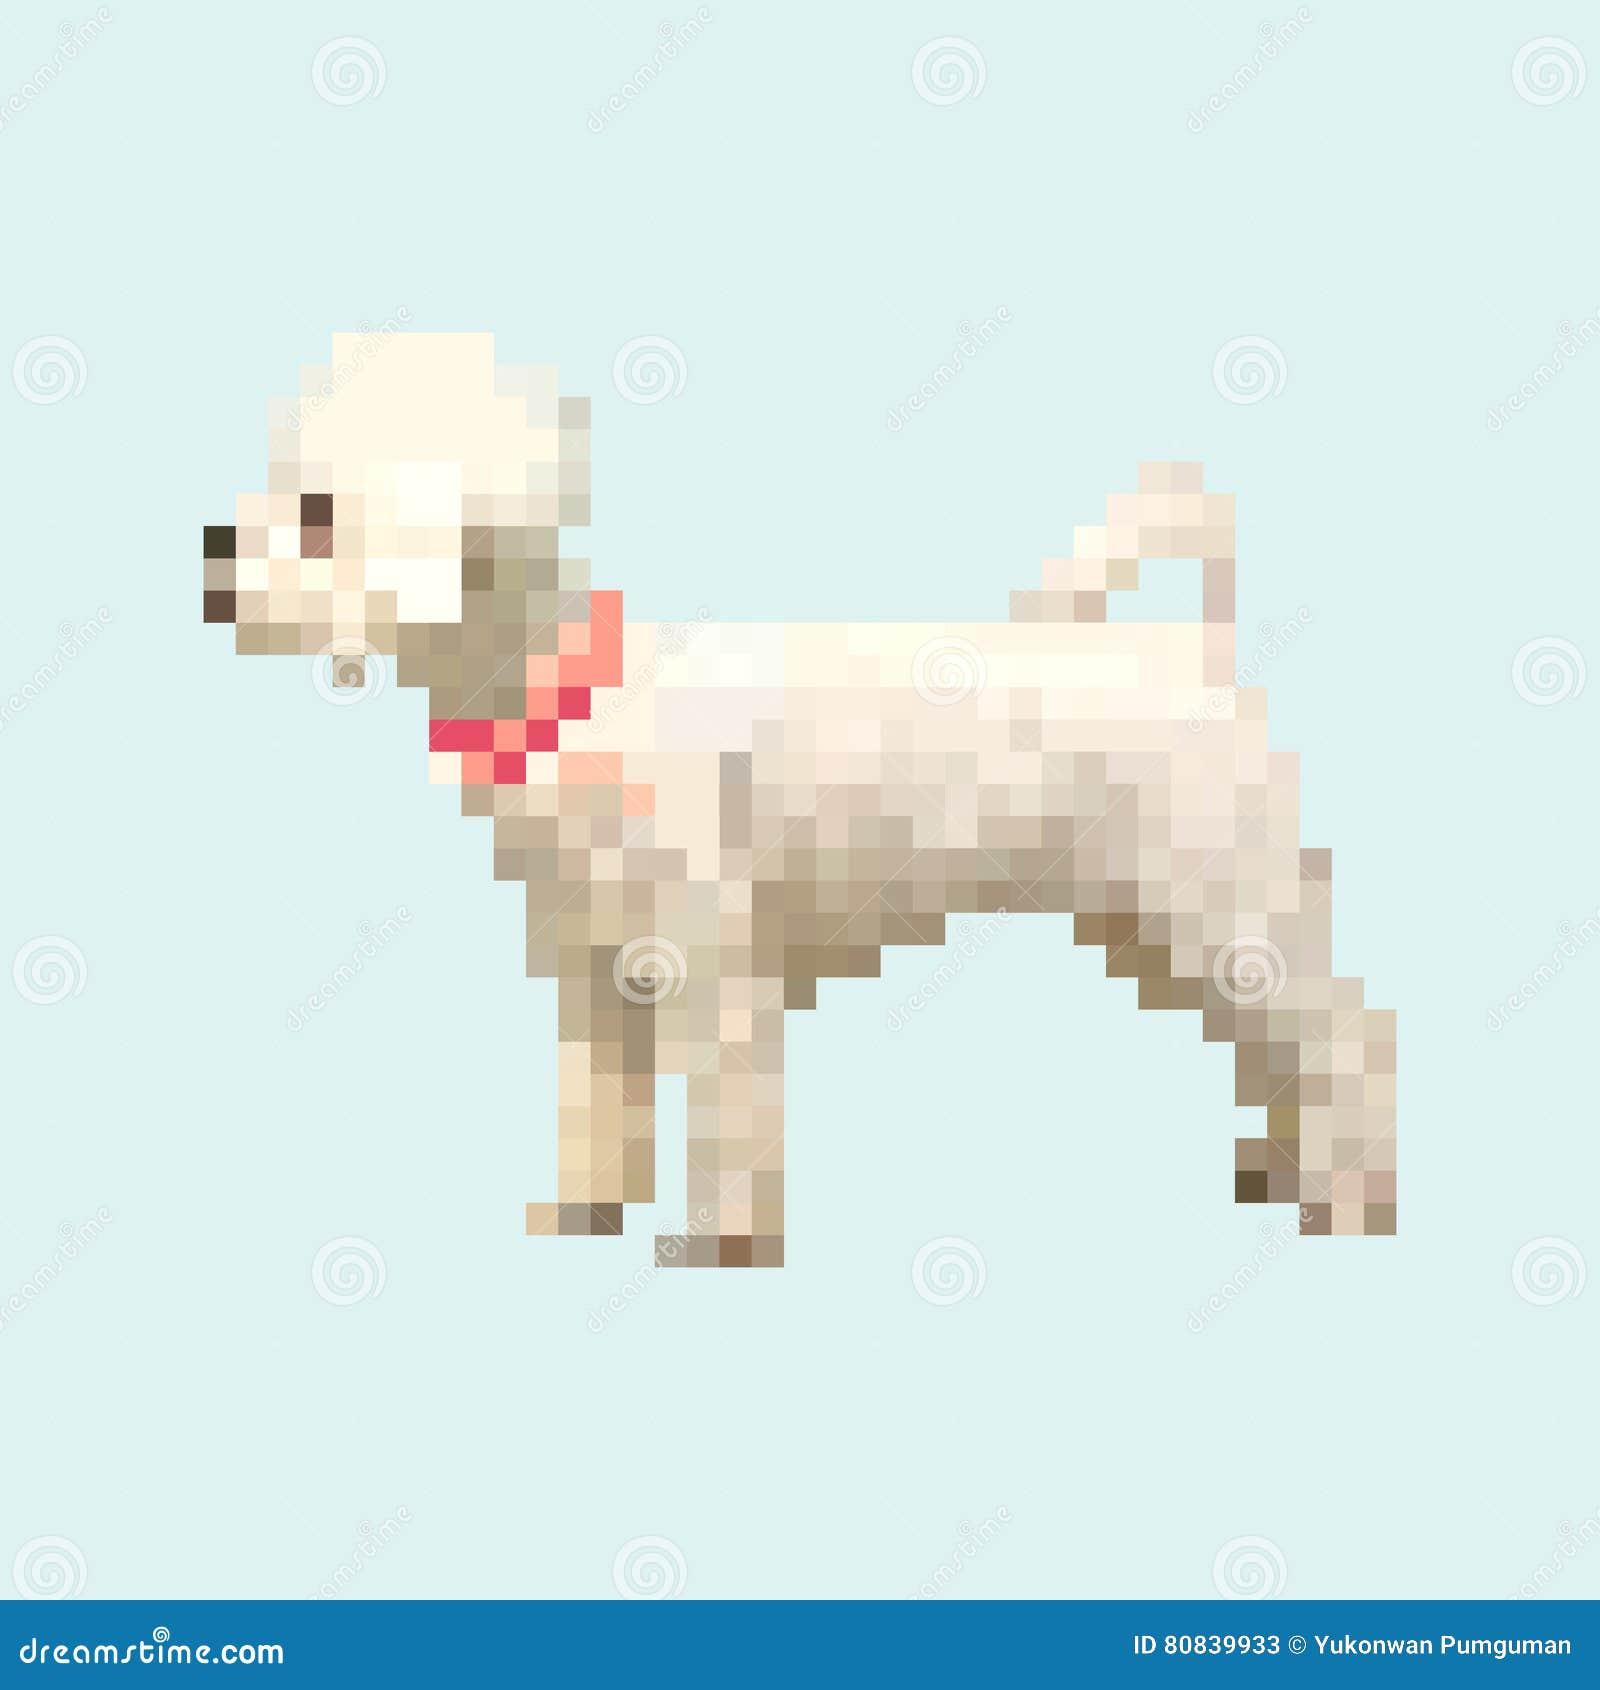 Poodle Dog Pixel Art Vector Pet Stock Vector Illustration